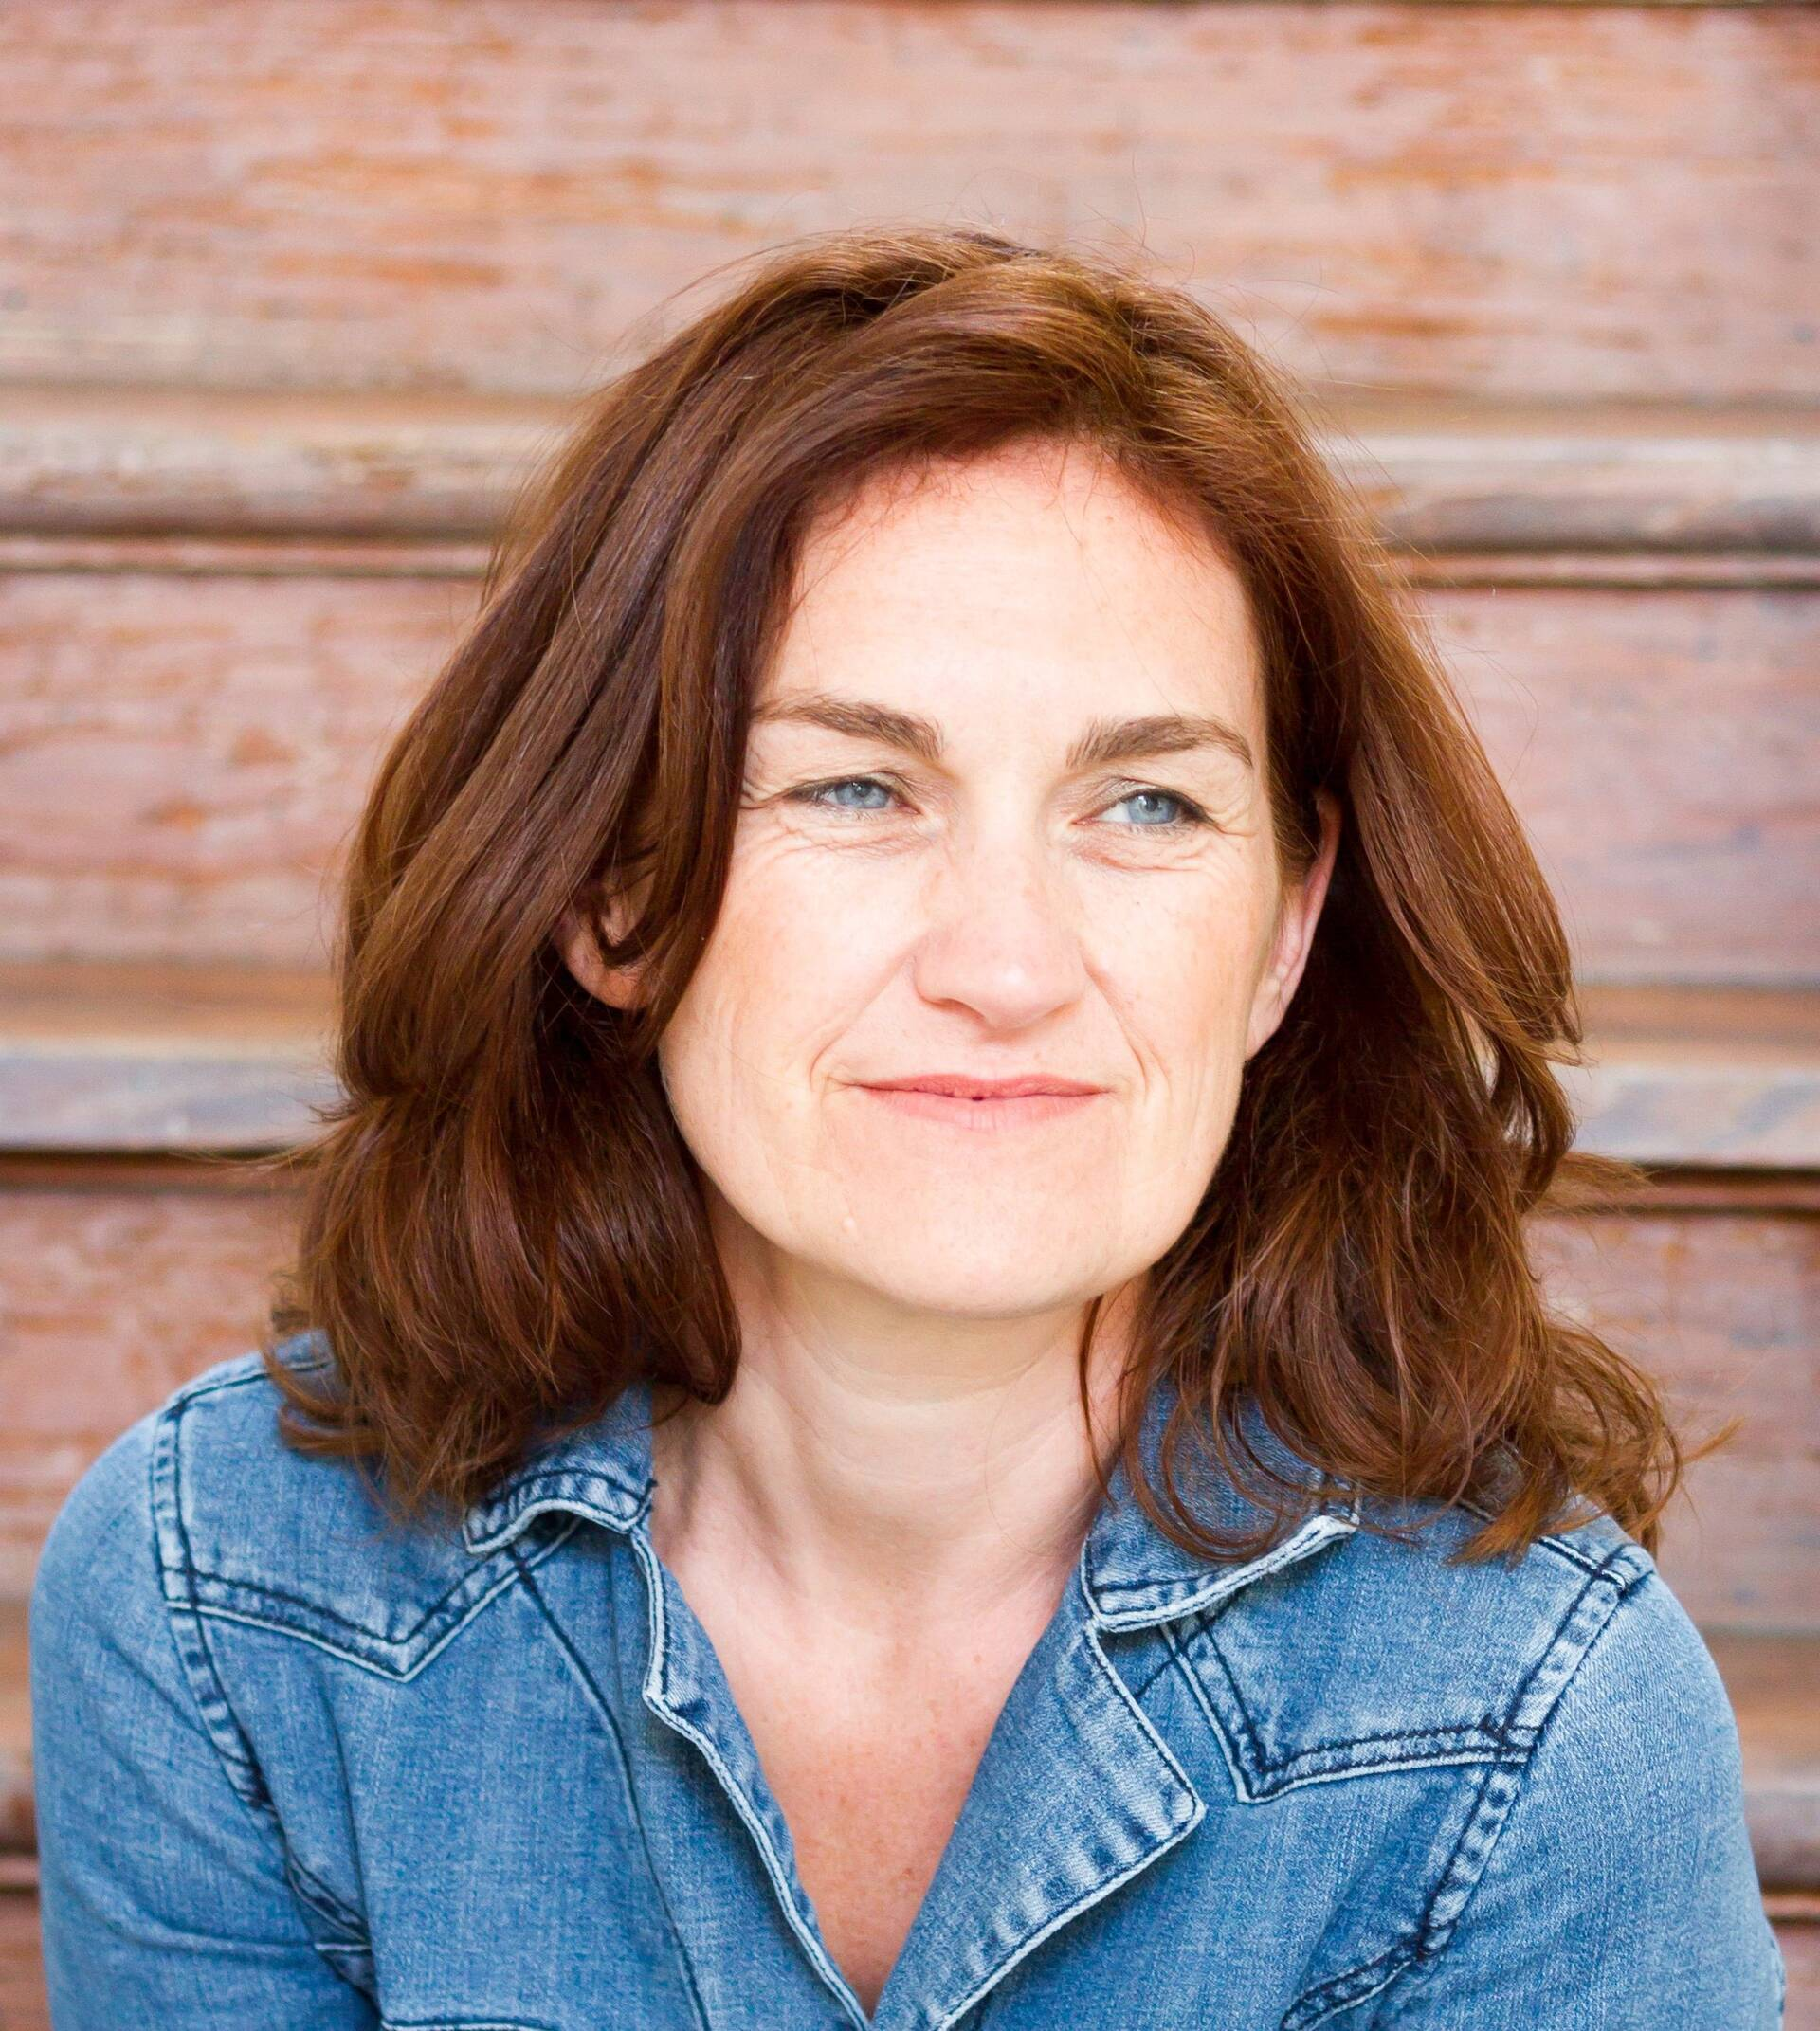 Cindy Van Autreve